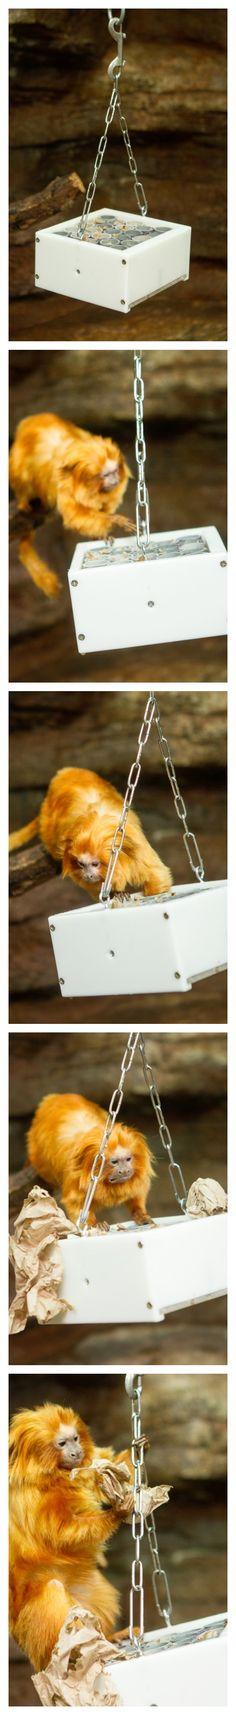 Honeycomb PVC Feeder for Golden-Lion Tamarin at Saint Louis Zoo.